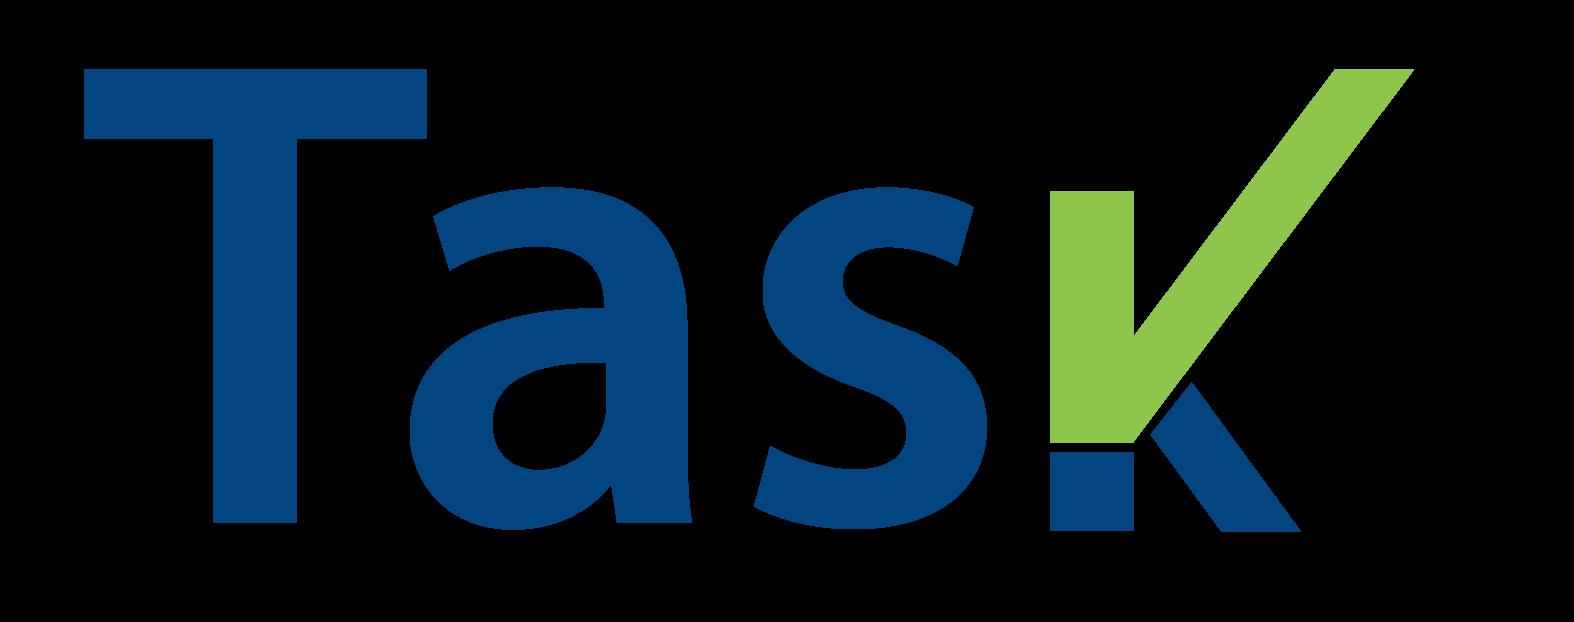 TASK12 - EIPA Registration (Performance Only)